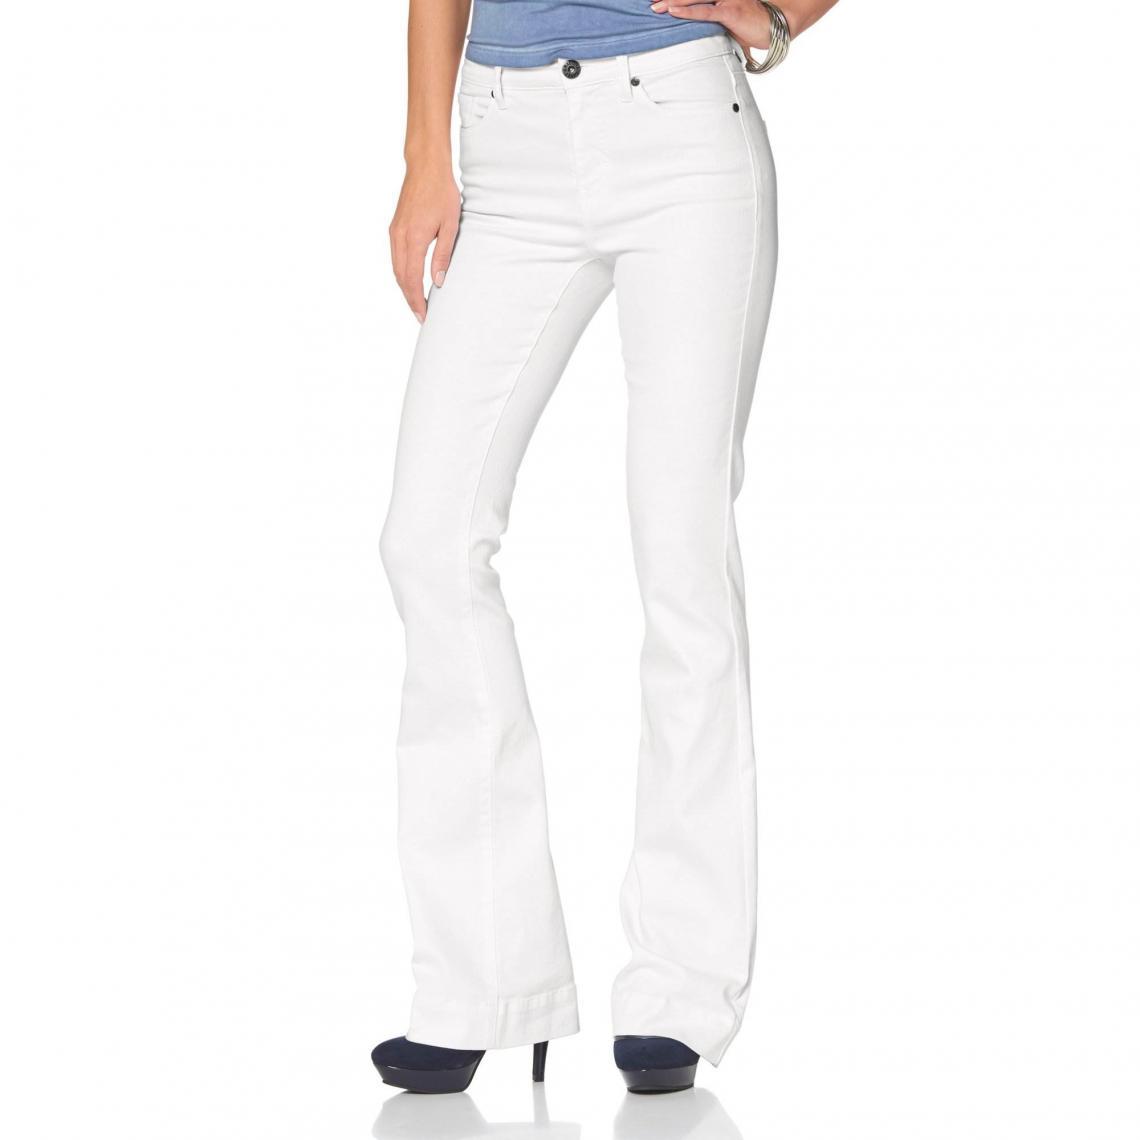 c453b3c11f80 Jean slim et pattes d éléphant femme Arizona - Blanc Arizona Femme